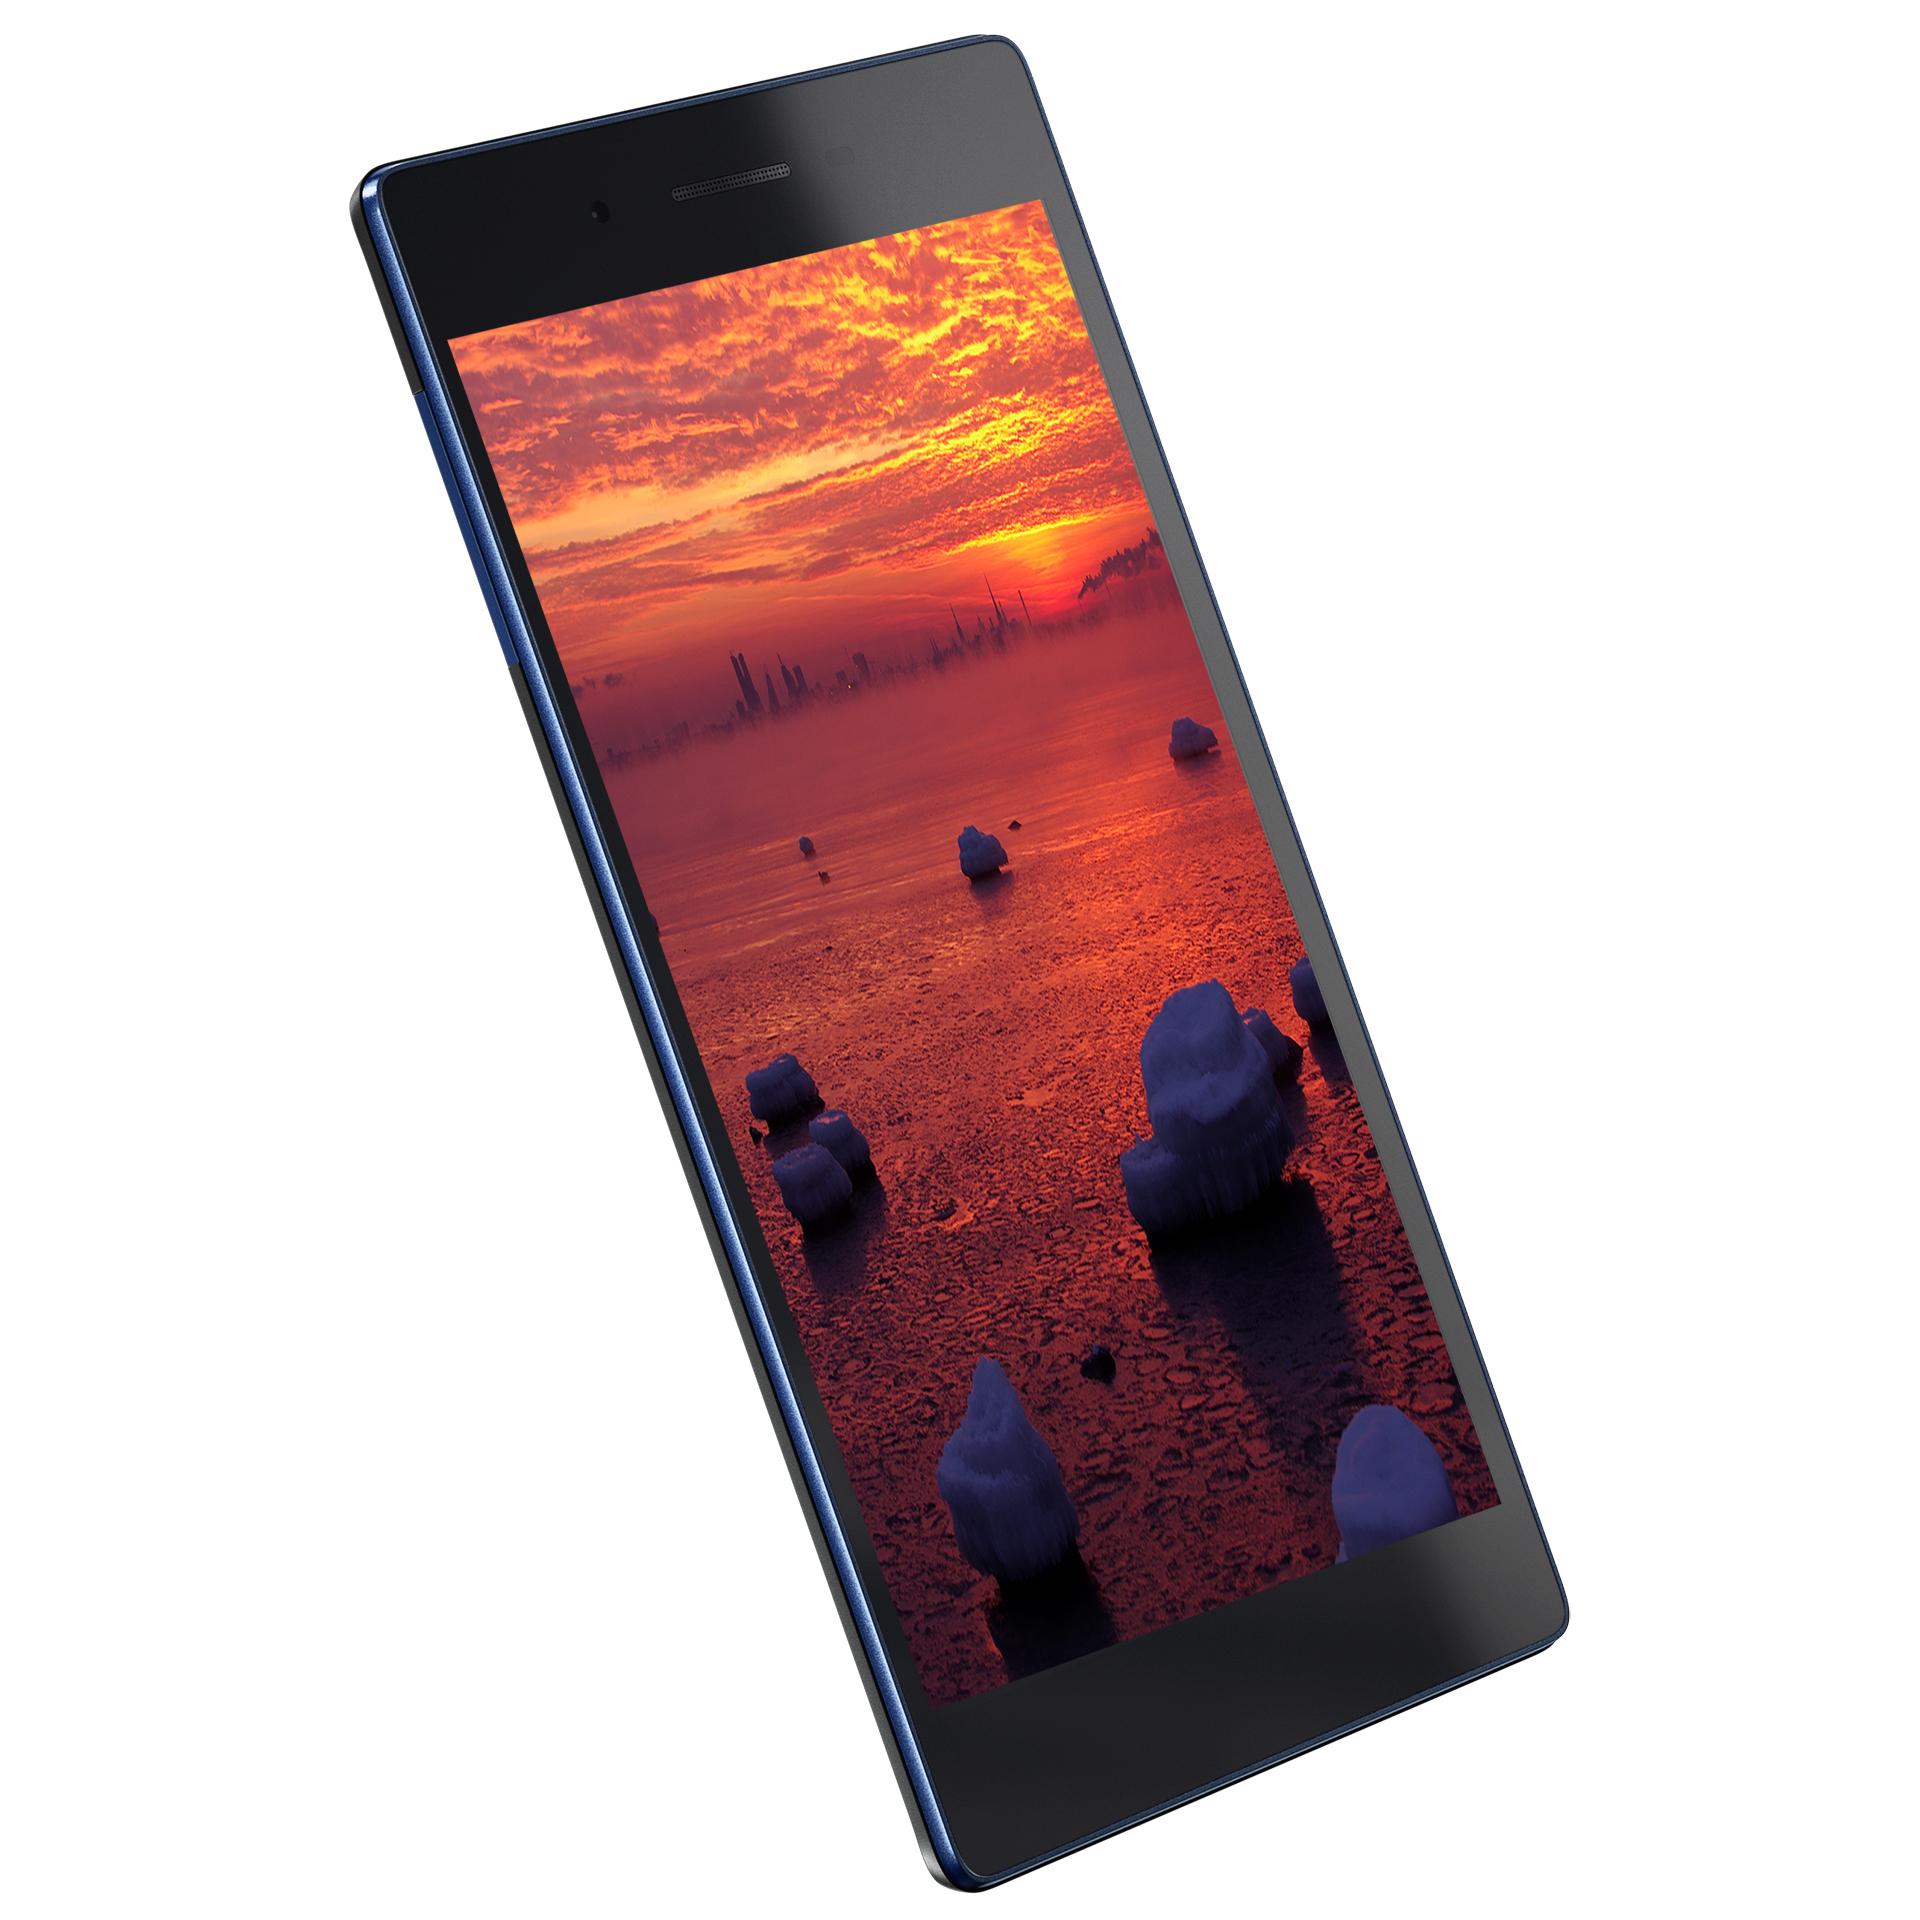 tahvelarvuti Lenovo Tab 7 16 GB 4G